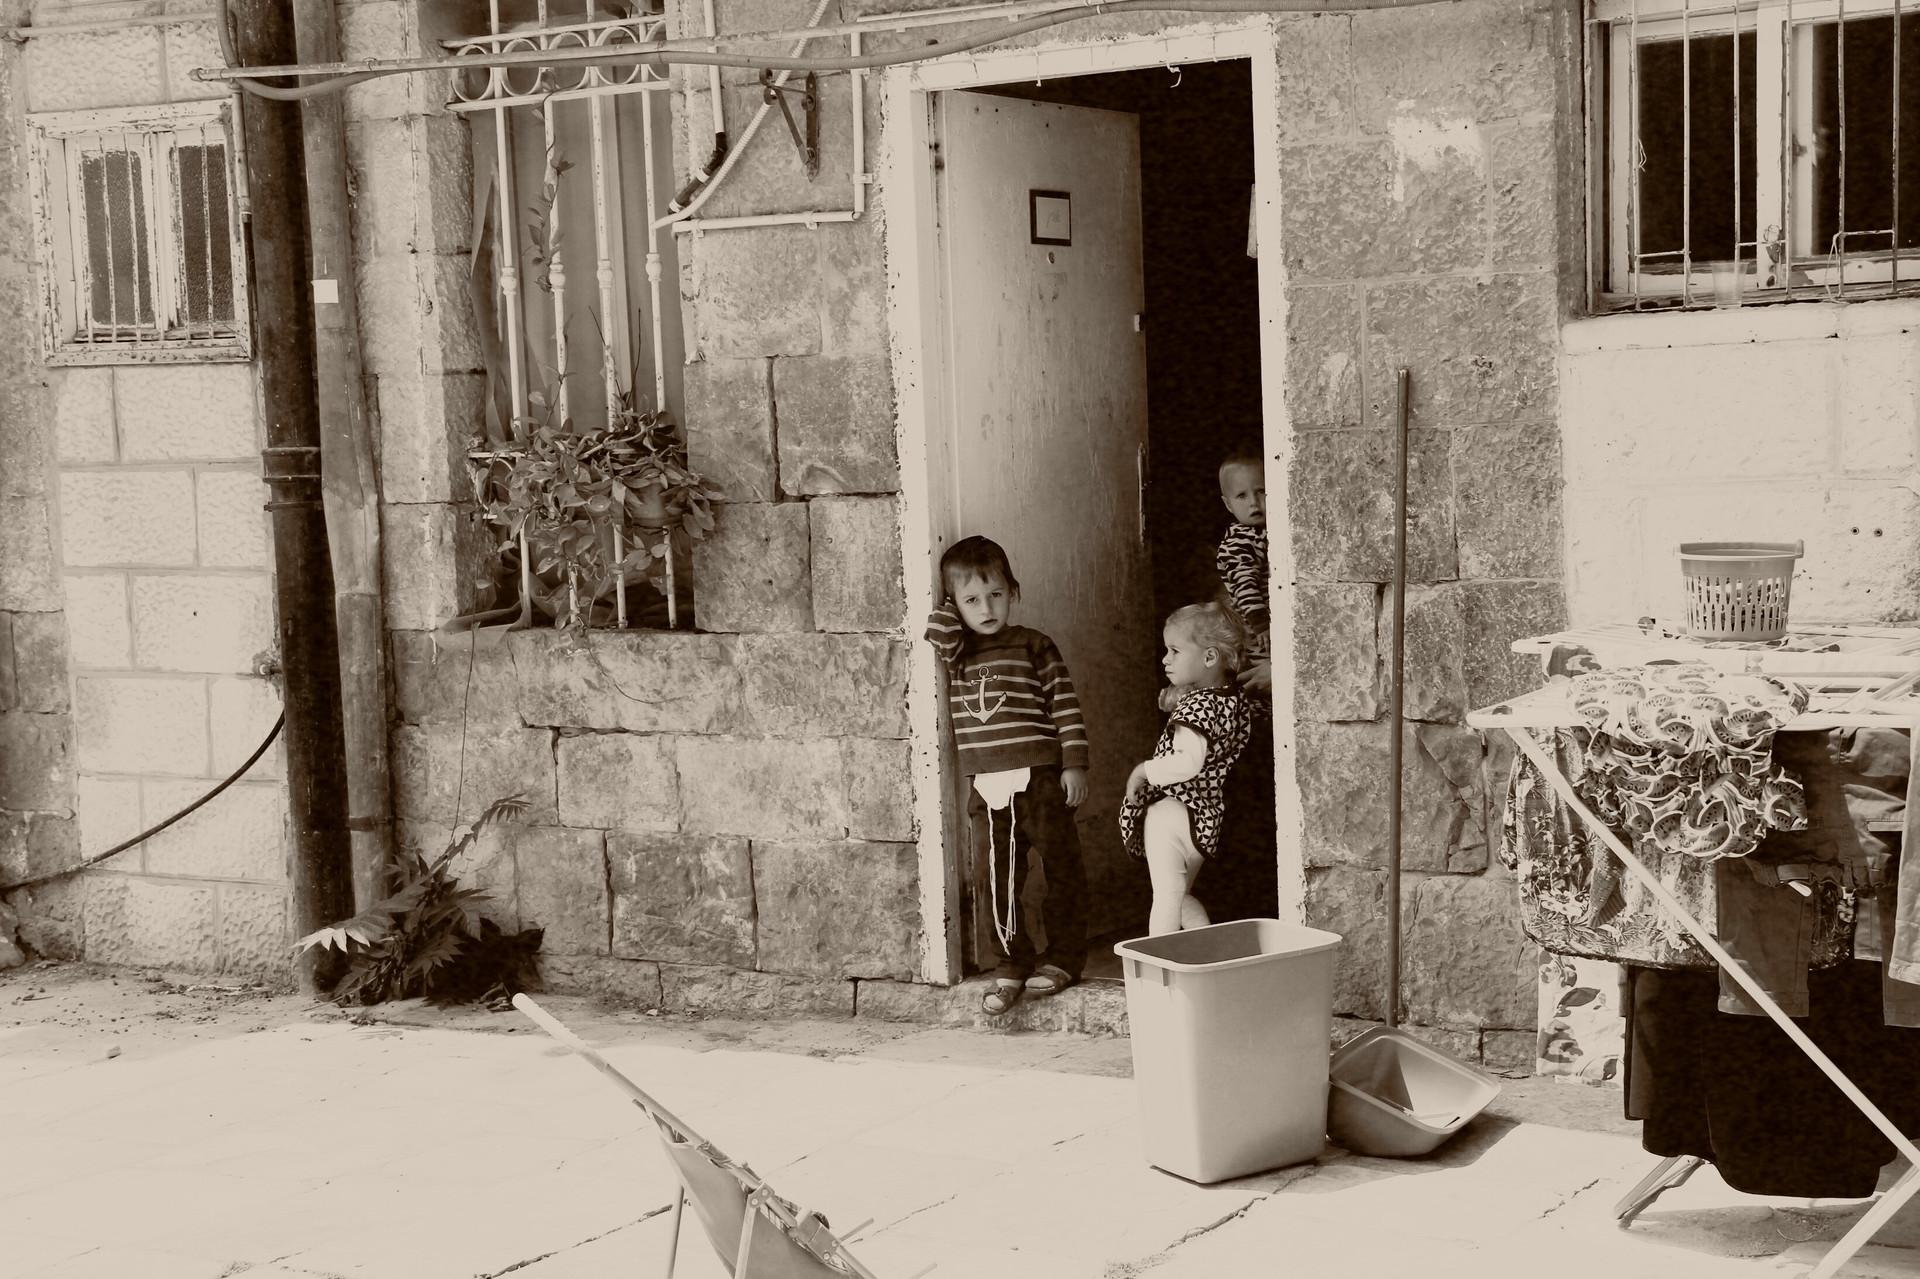 Jewish kids